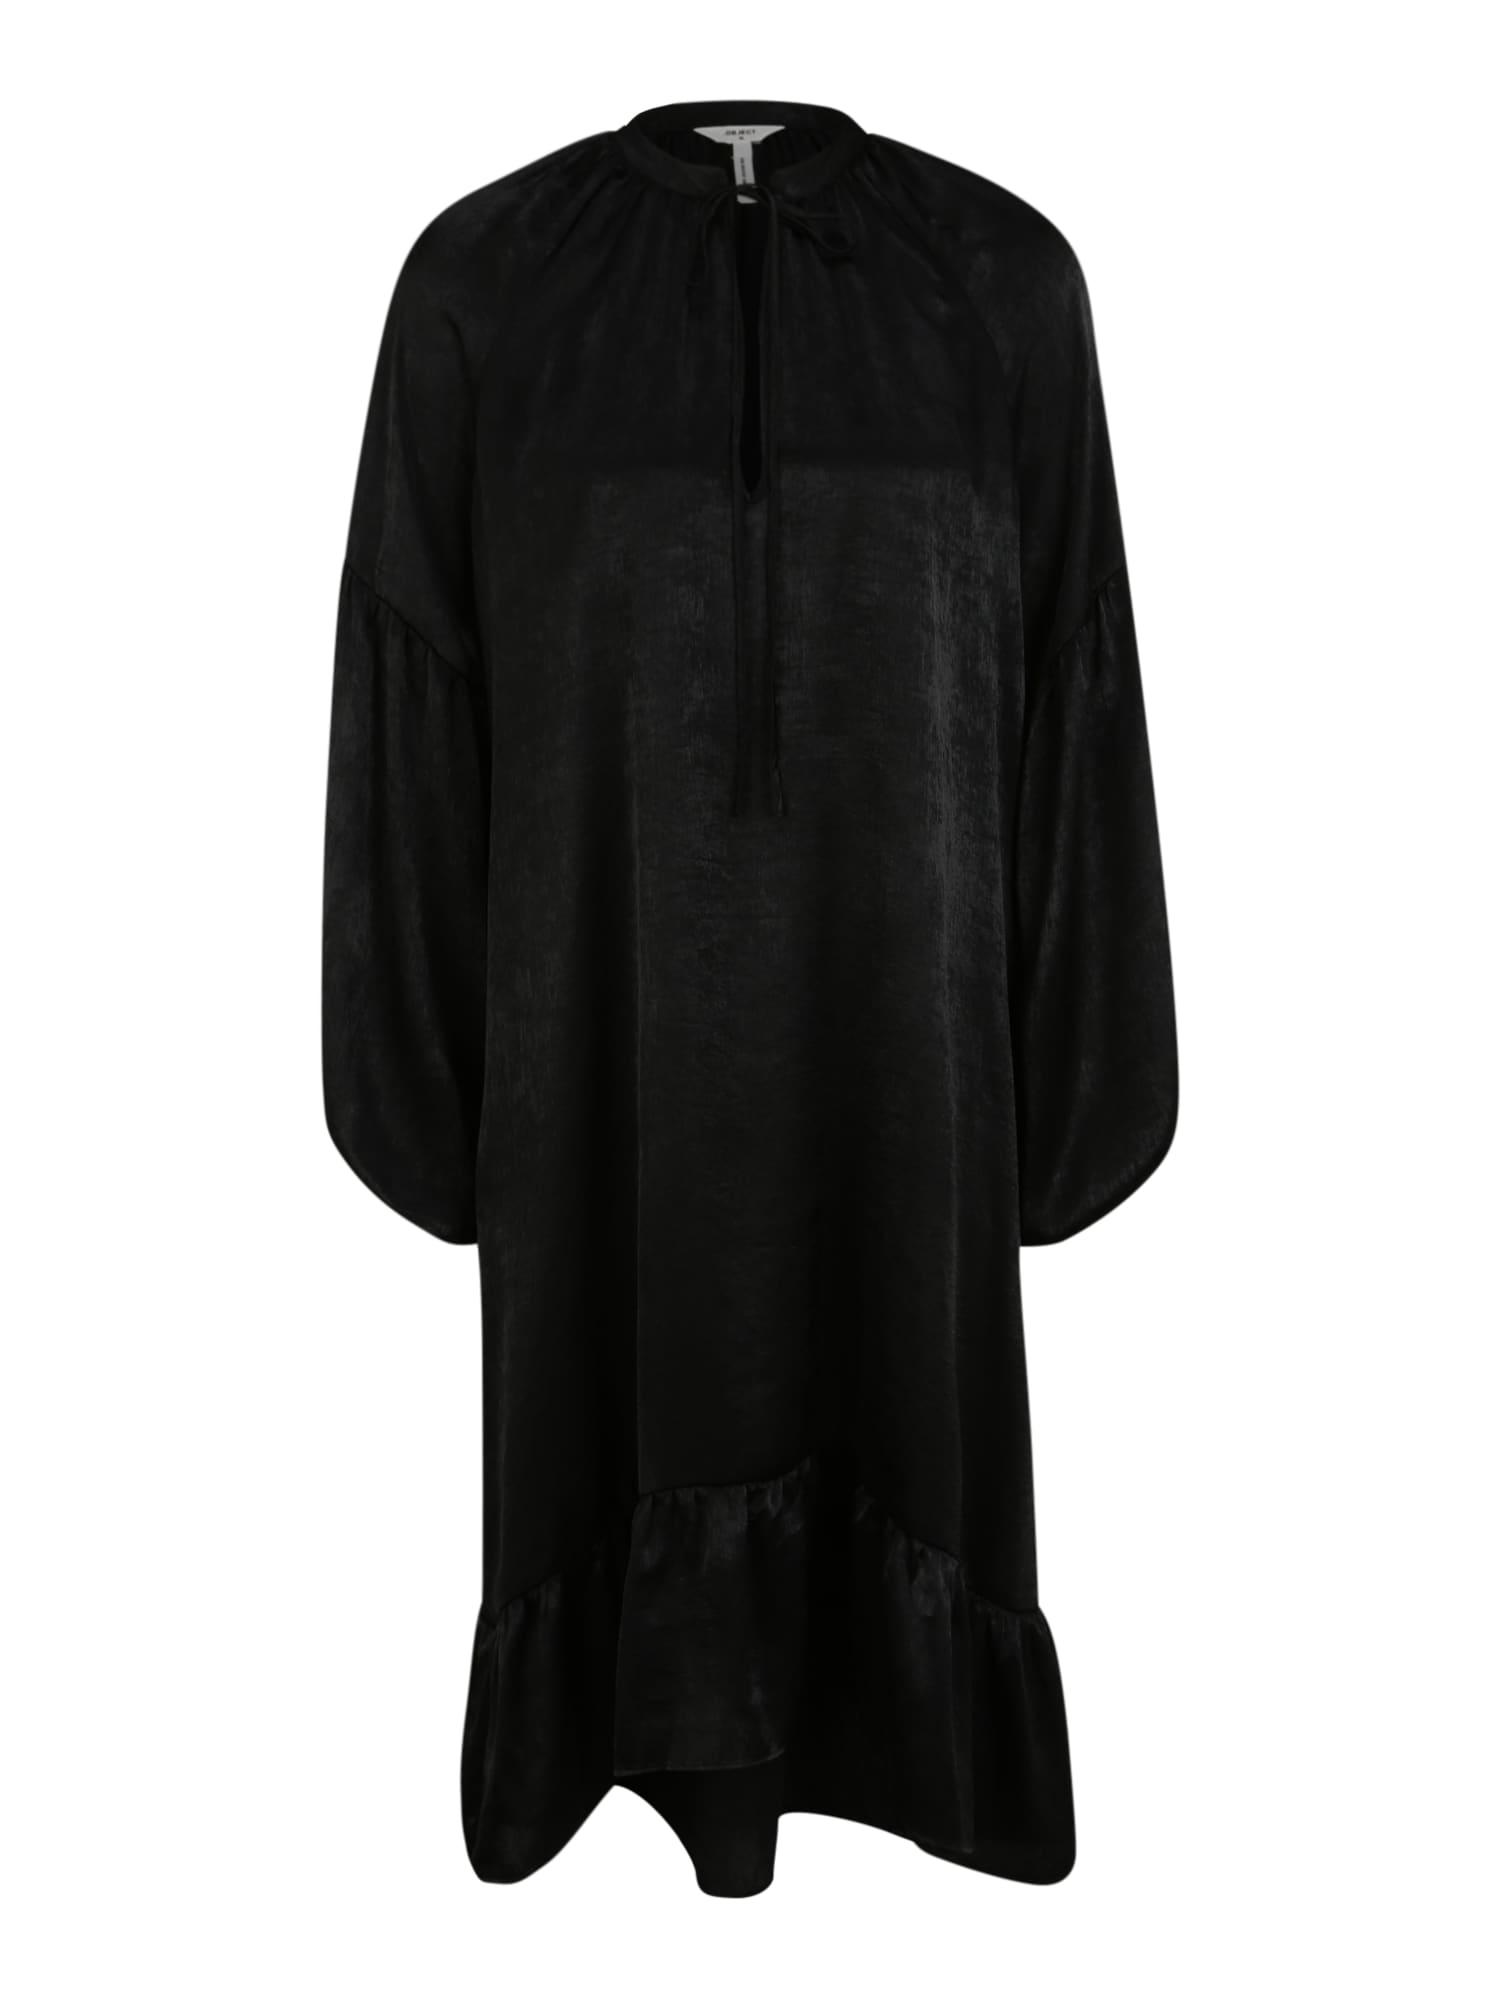 OBJECT (Tall) Suknelė